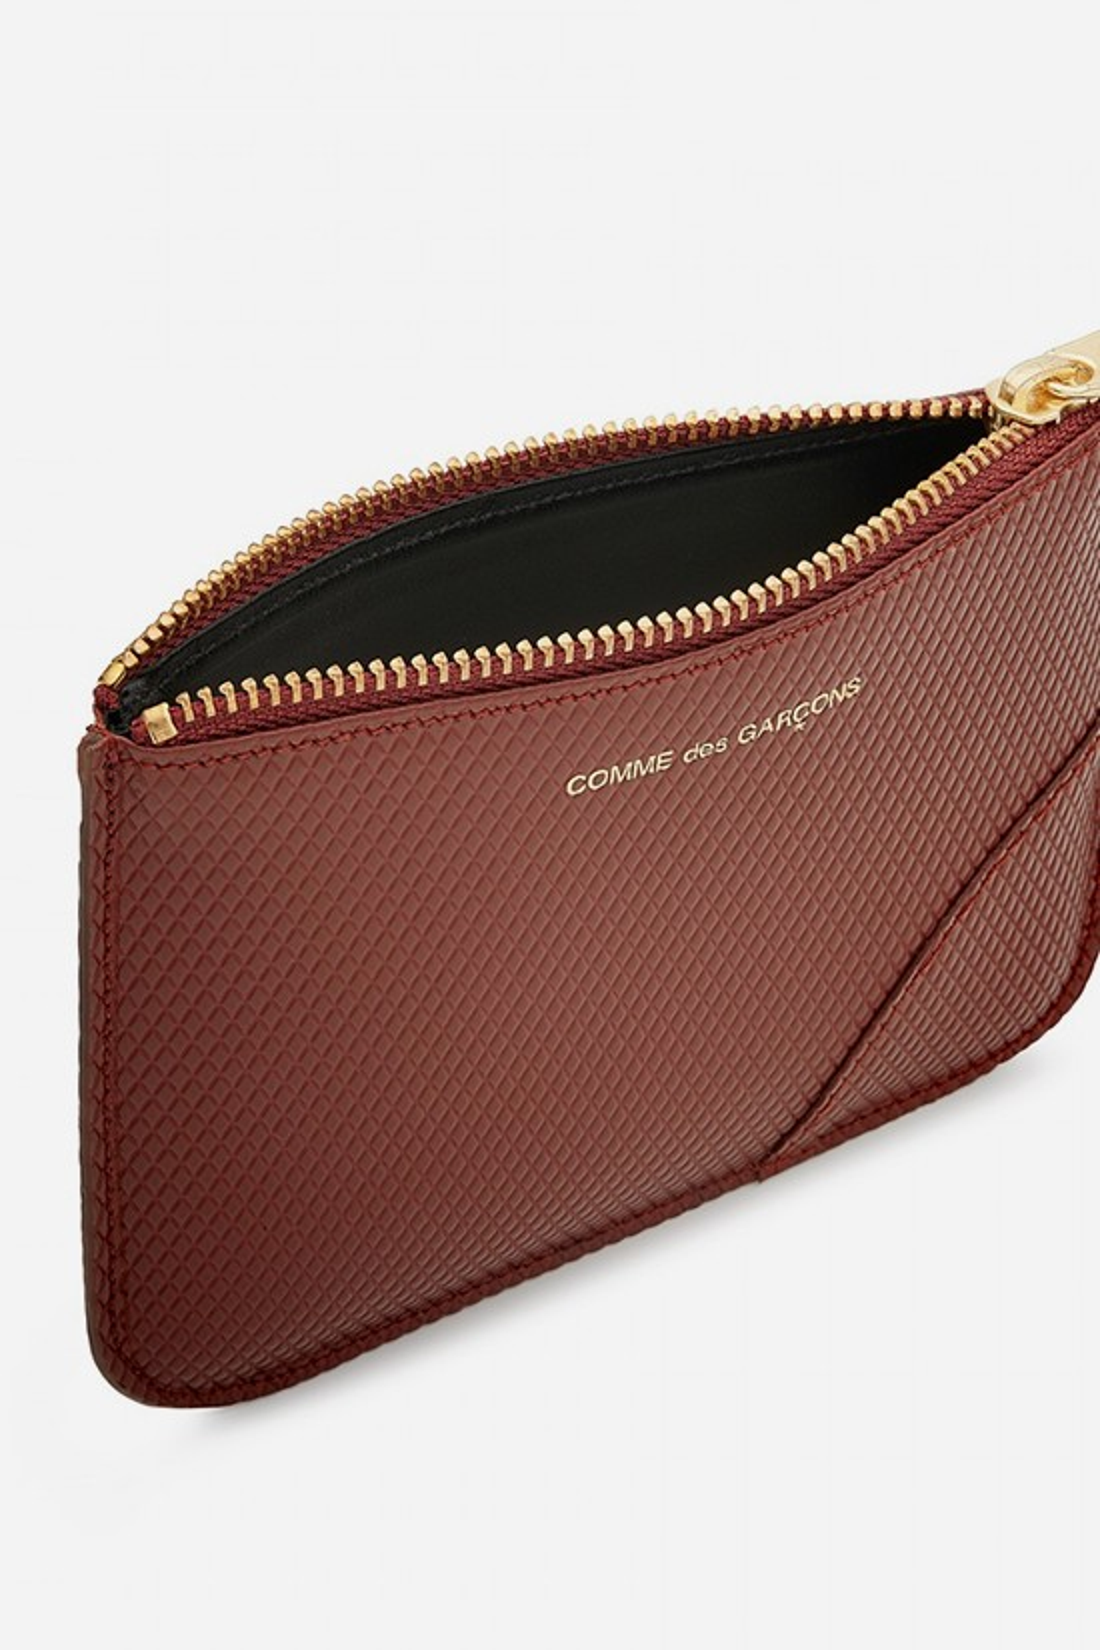 CDG WALLETS FOR WOMAN / Cdg luxury group sa8100lg Brown